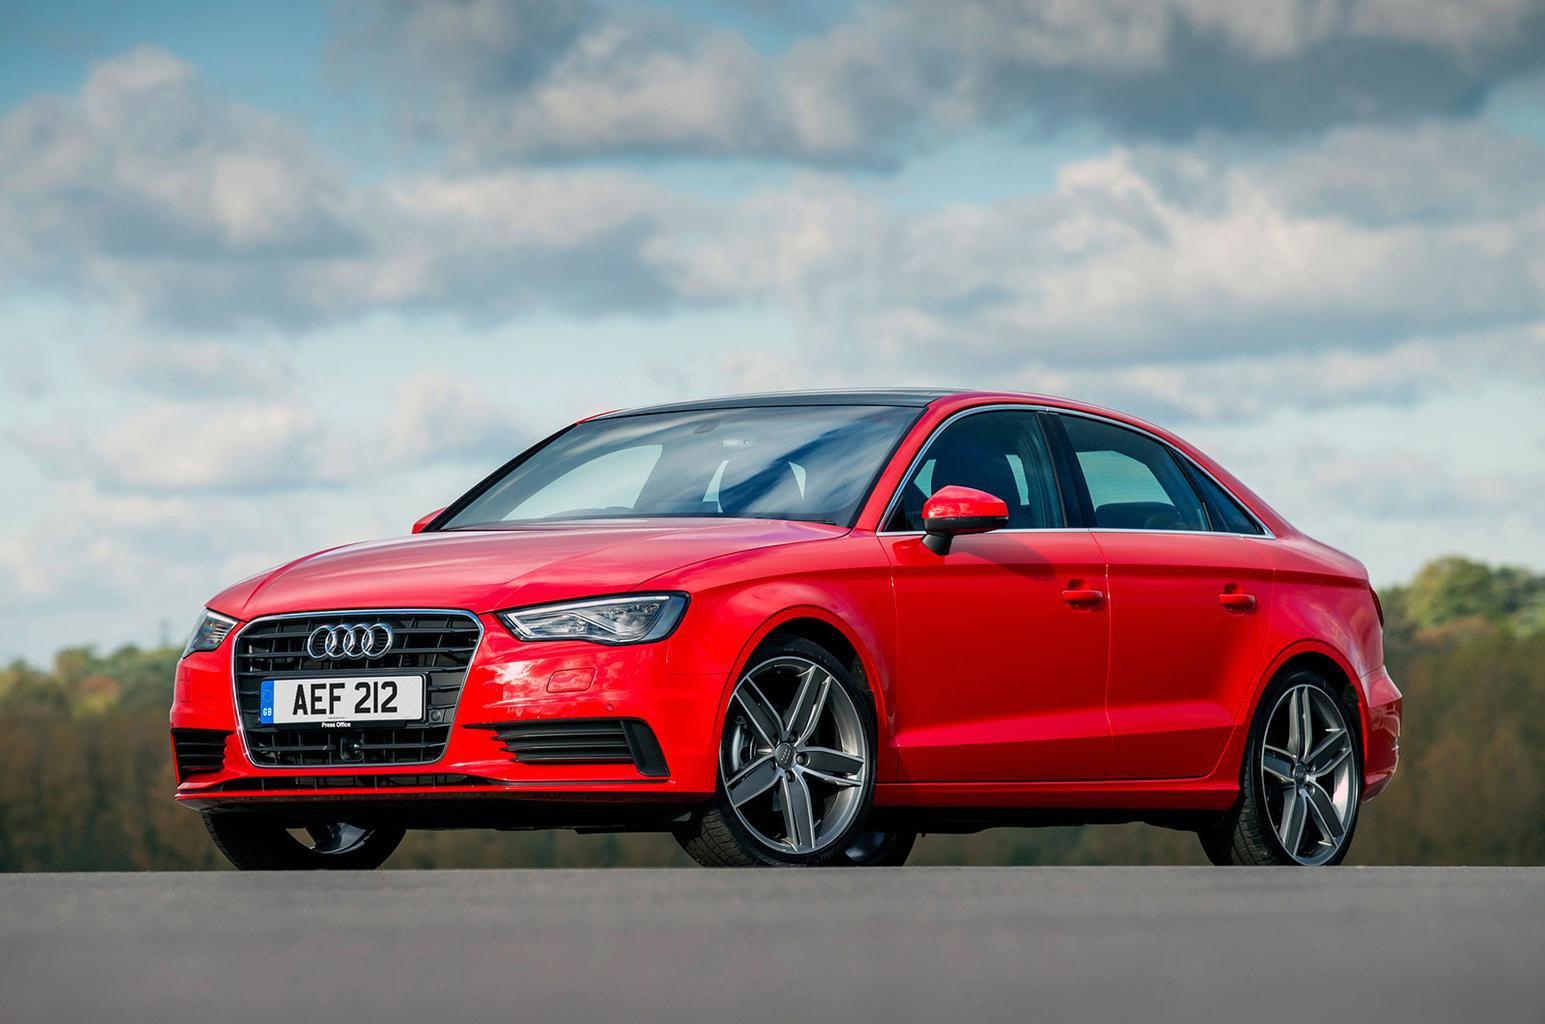 Audi A3 saloon (petrol)